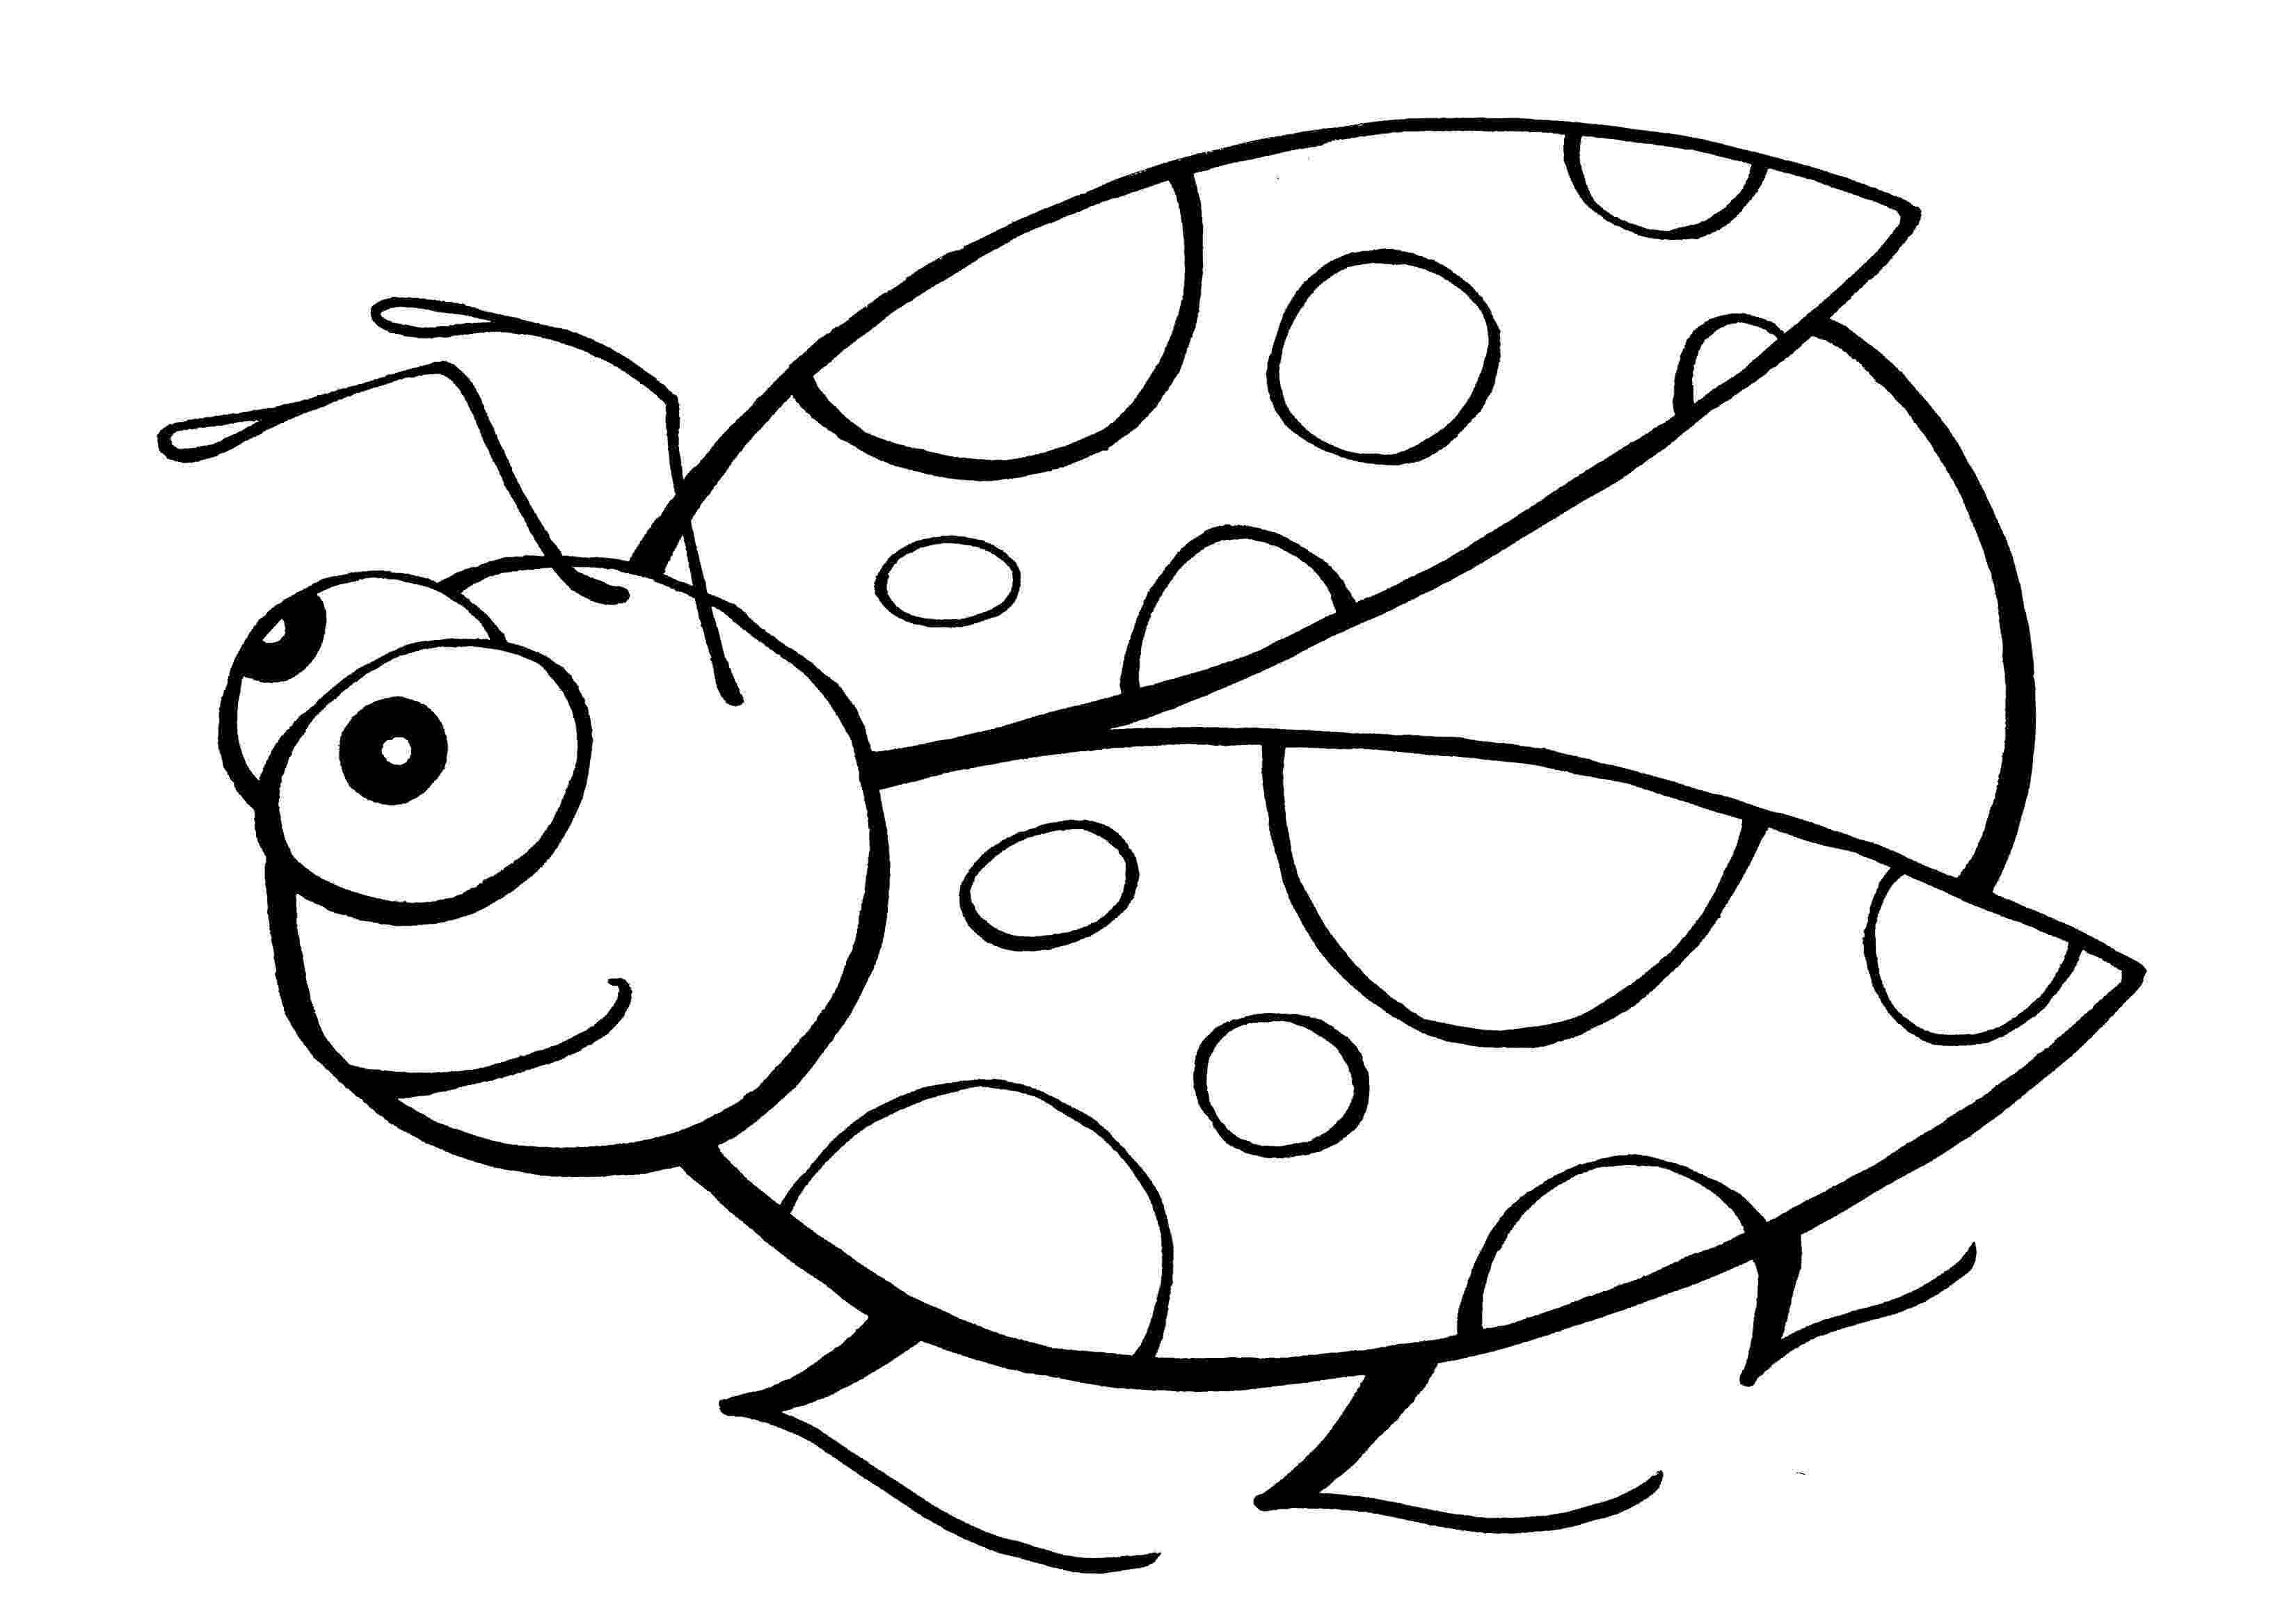 ladybugs coloring pages free printable ladybug coloring pages for kids pages ladybugs coloring